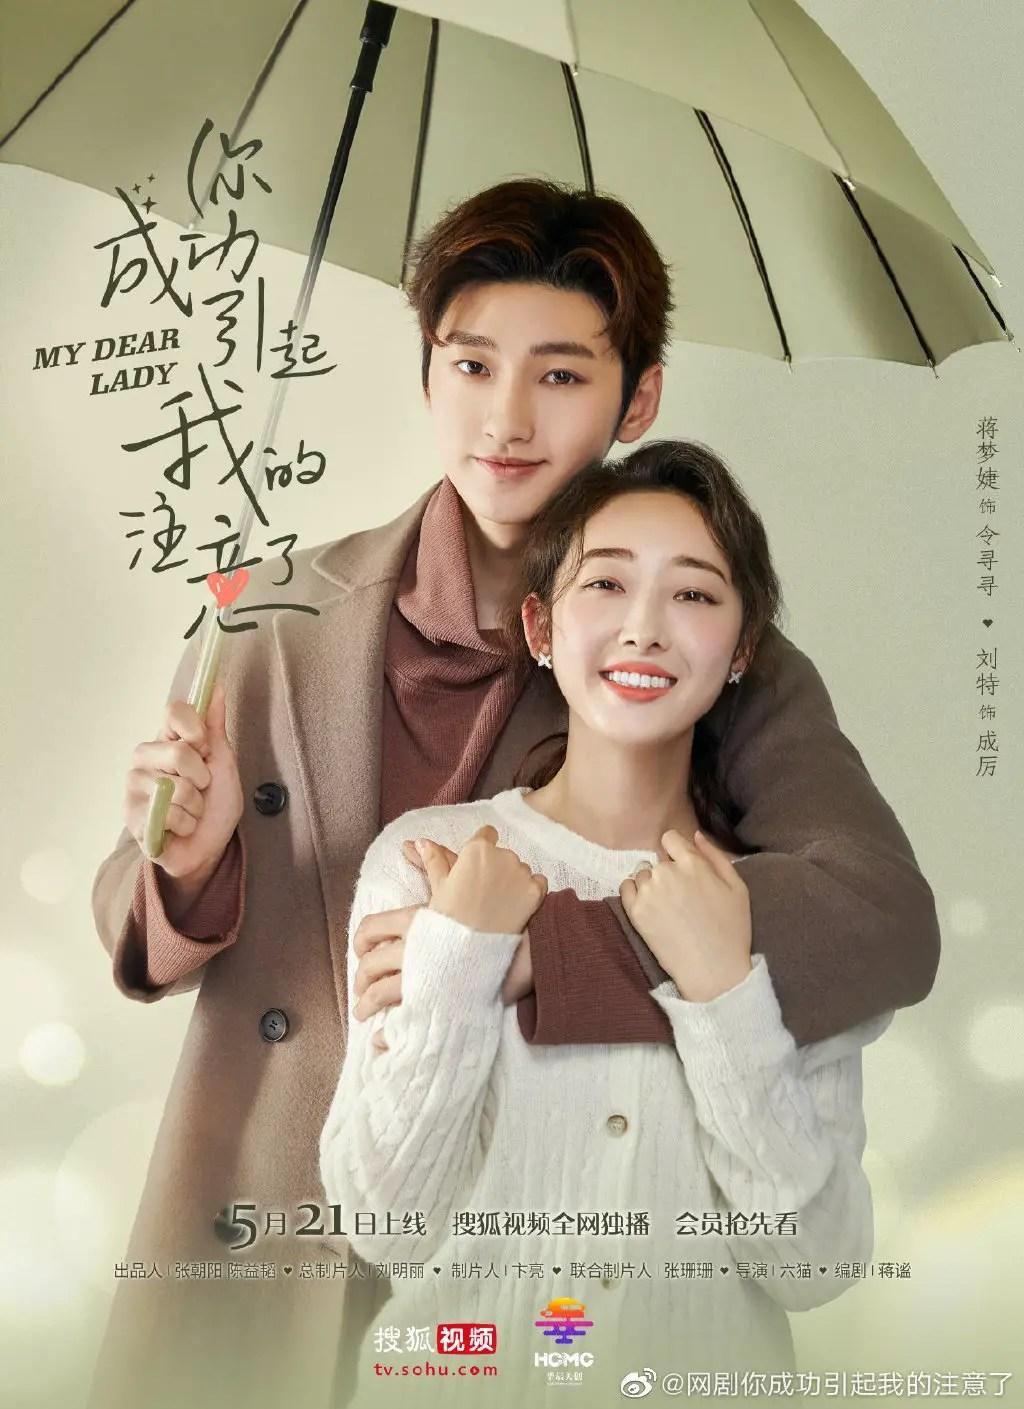 My Dear Lady Poster